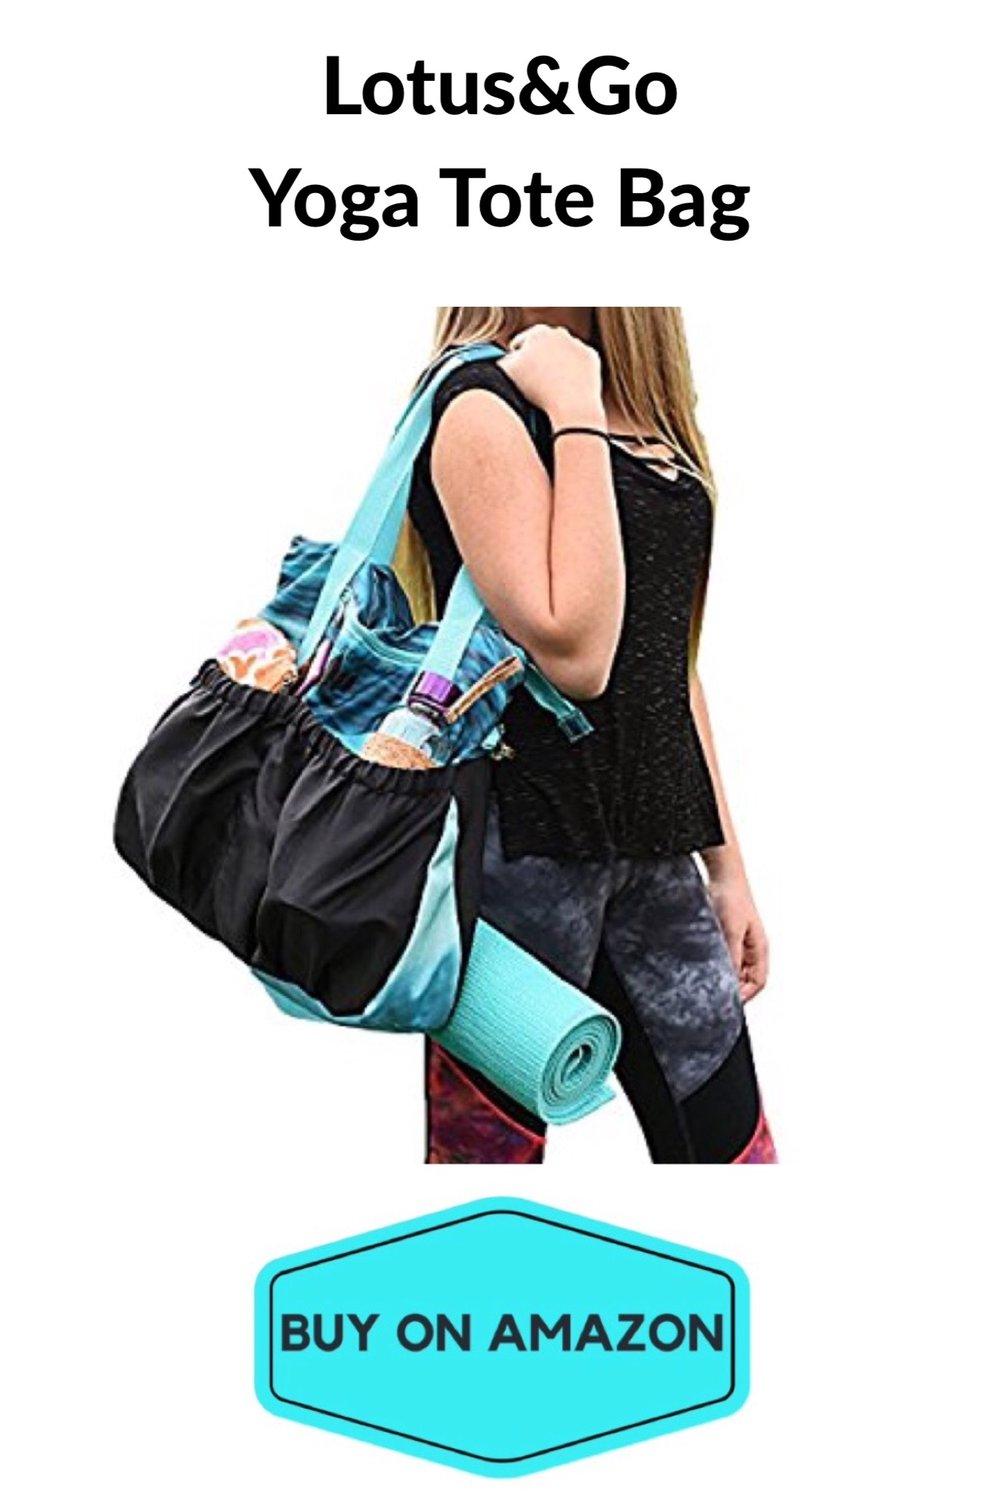 Lotus&Go Yoga Tote Bag